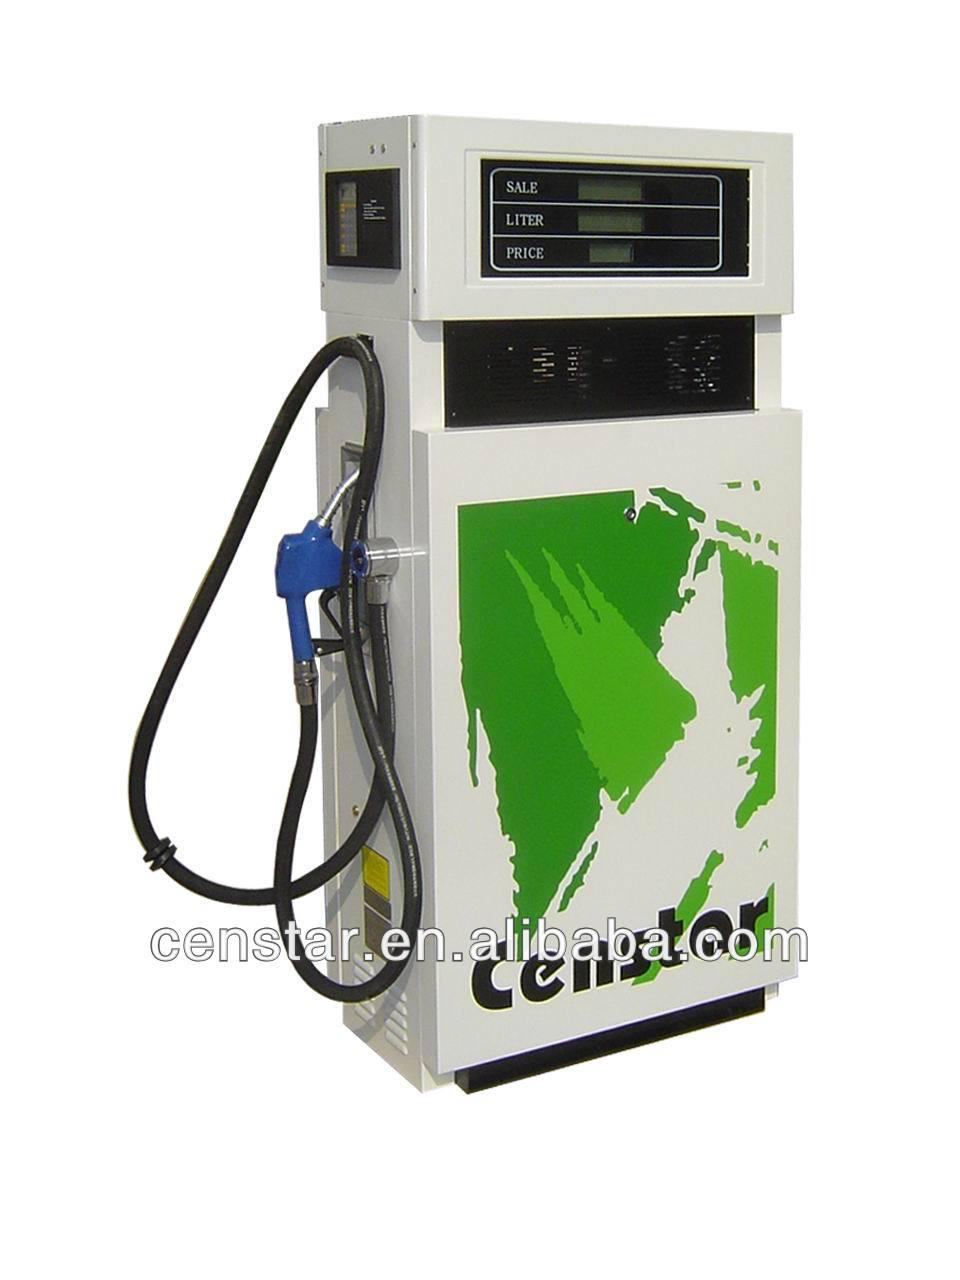 Gasoline diesel kerosene fuel pump dispenser cs10 series